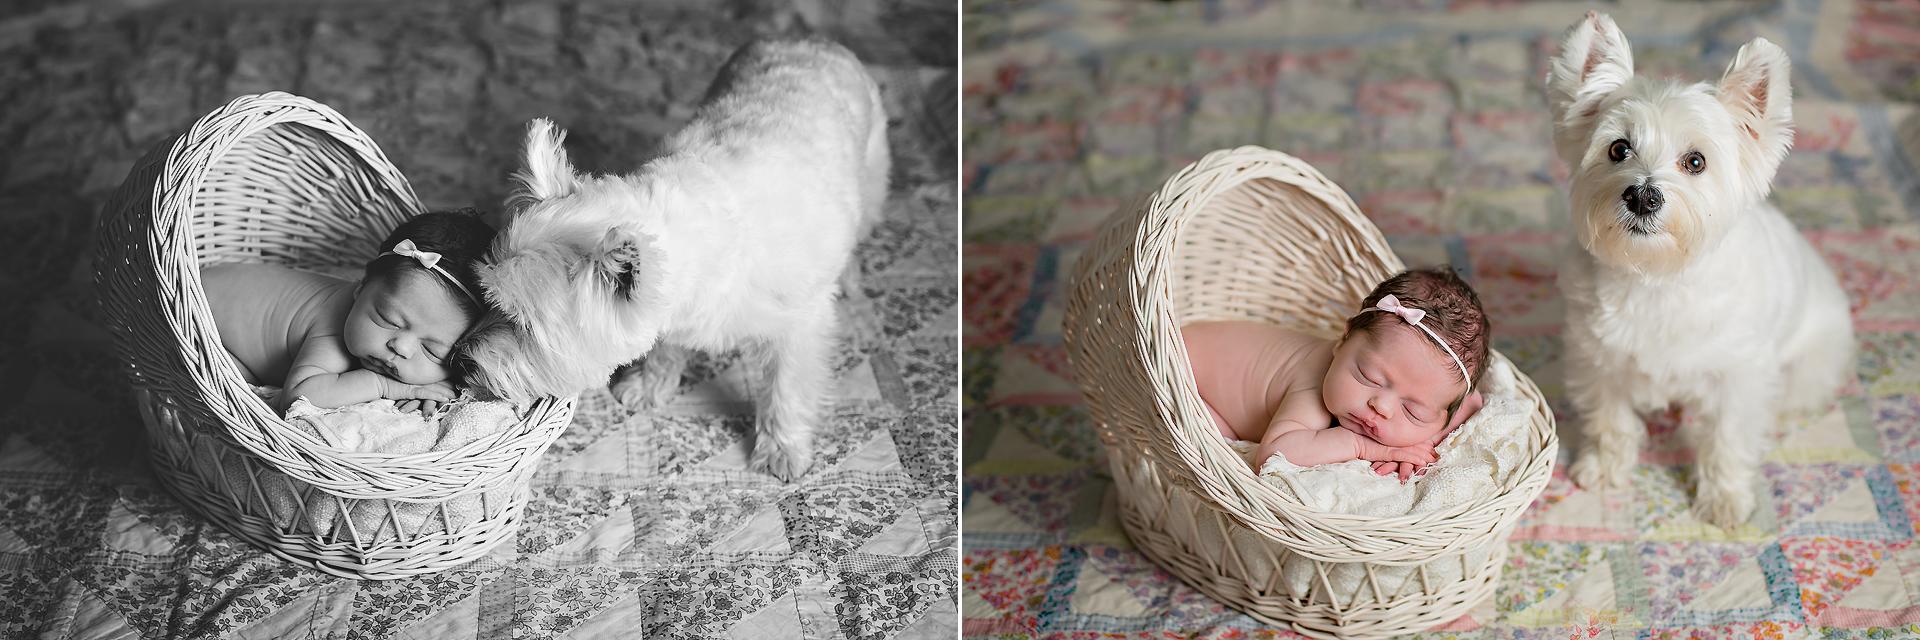 Sleeping newborn and dog pose - Tonya Teran Photography - Bethesda, MD Newborn Baby and Family Photographer